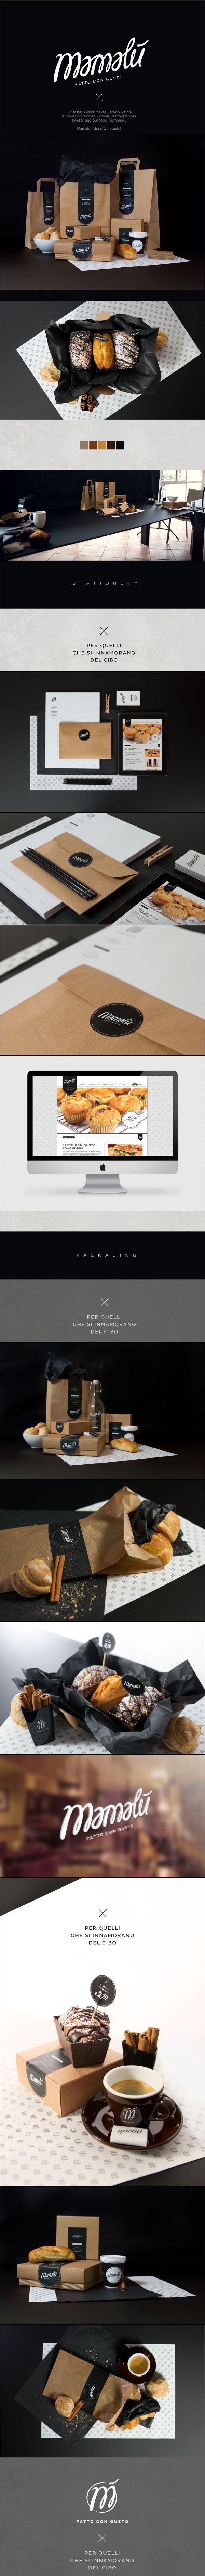 MAMALÙ #identity #packaging